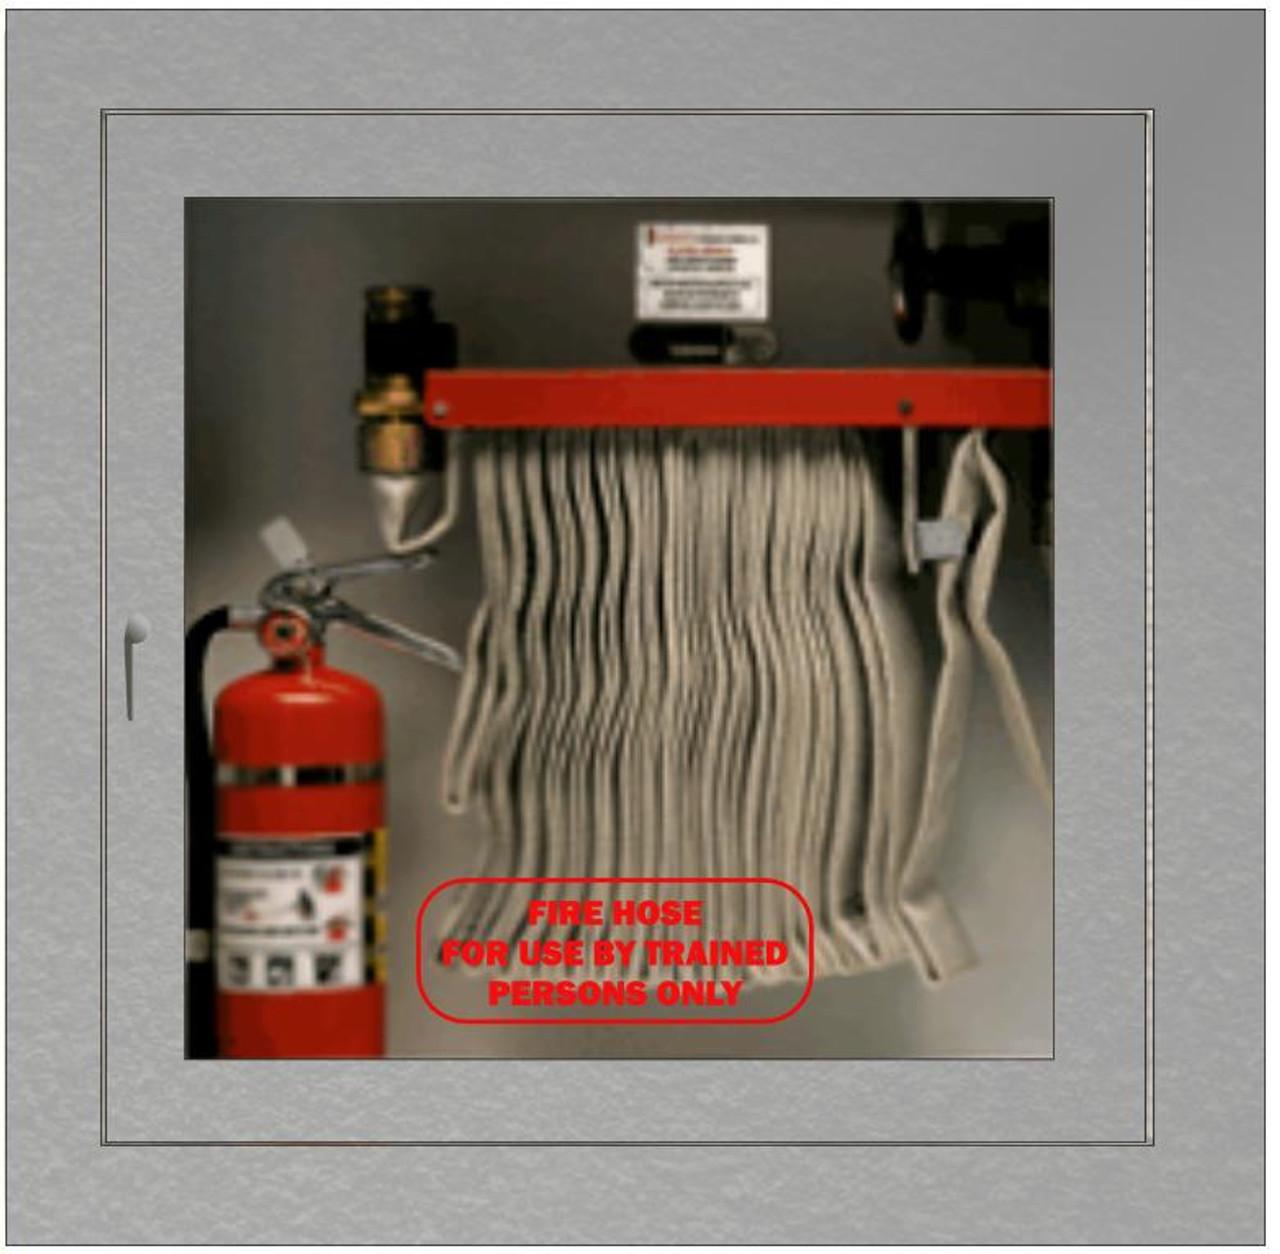 Fire Hose Cabinet Sticker Red Apex Window Films